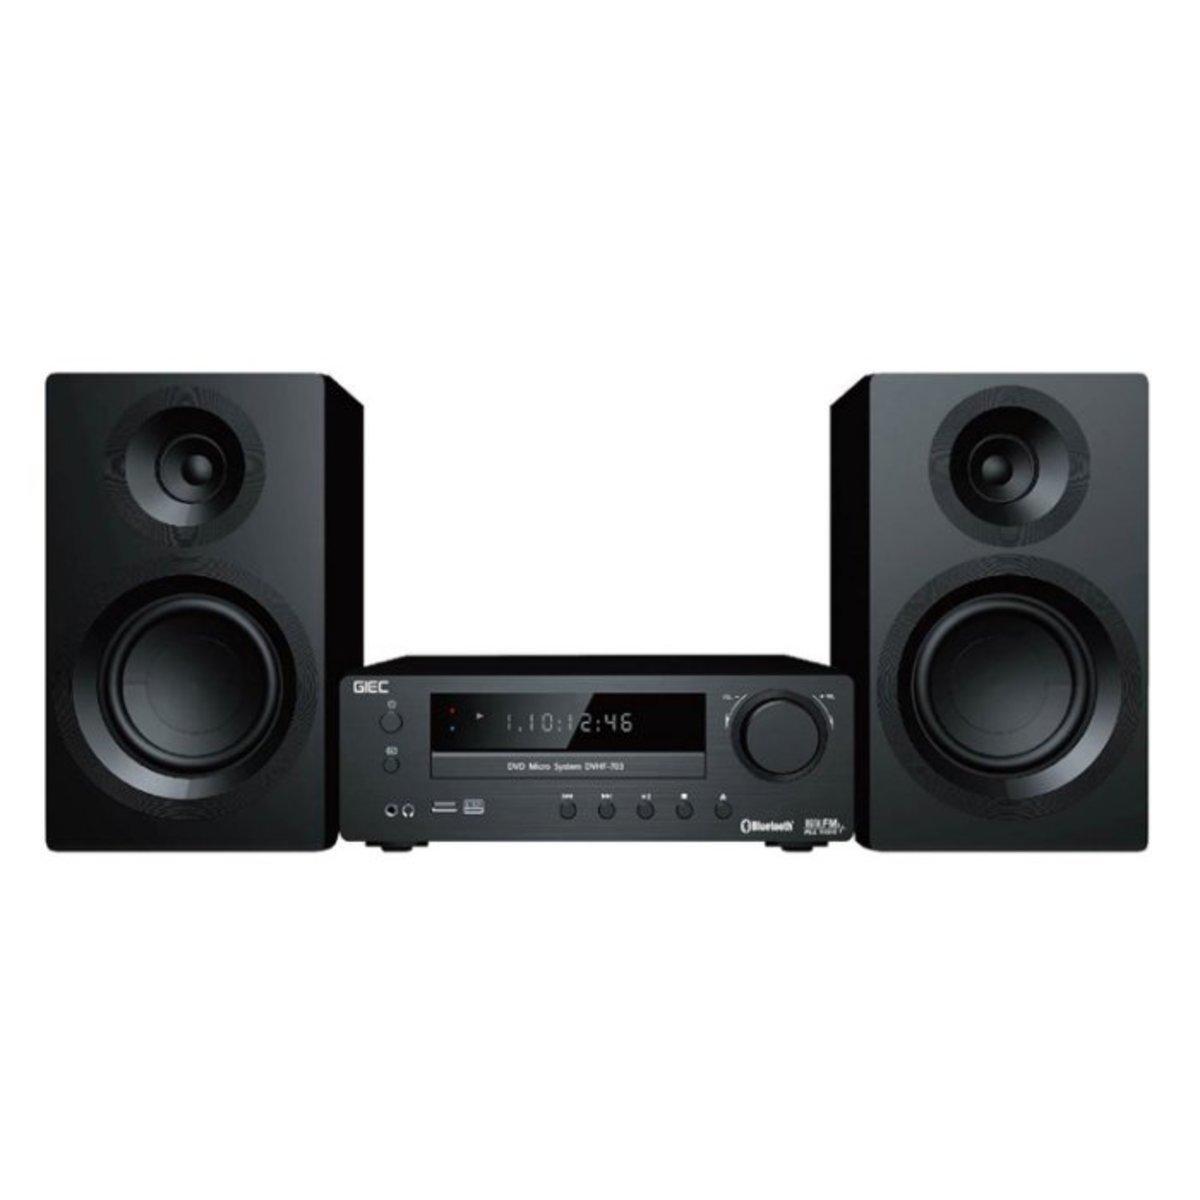 DVD Karaoke Audio Combination DVHF703